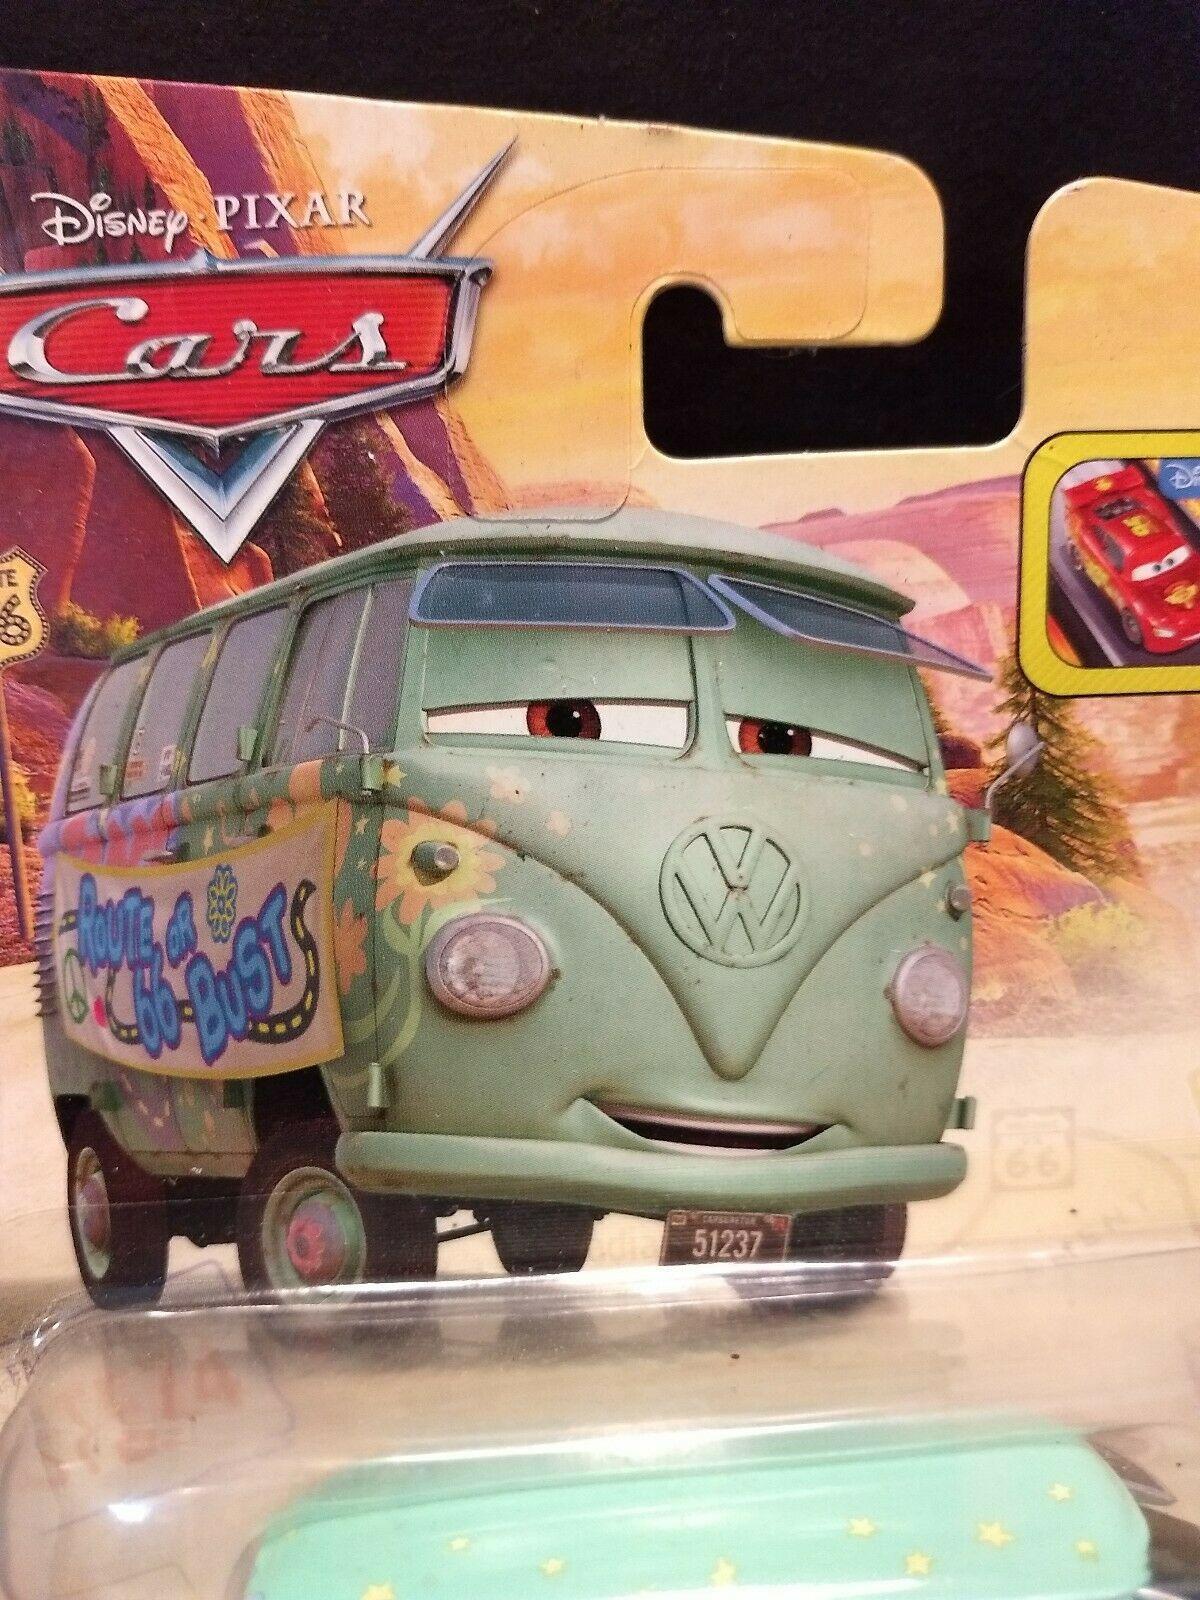 Sealed 2015 Mattel Pixar Disney Cars Fillmore Road Trip toy van Route 66 or Bust image 3